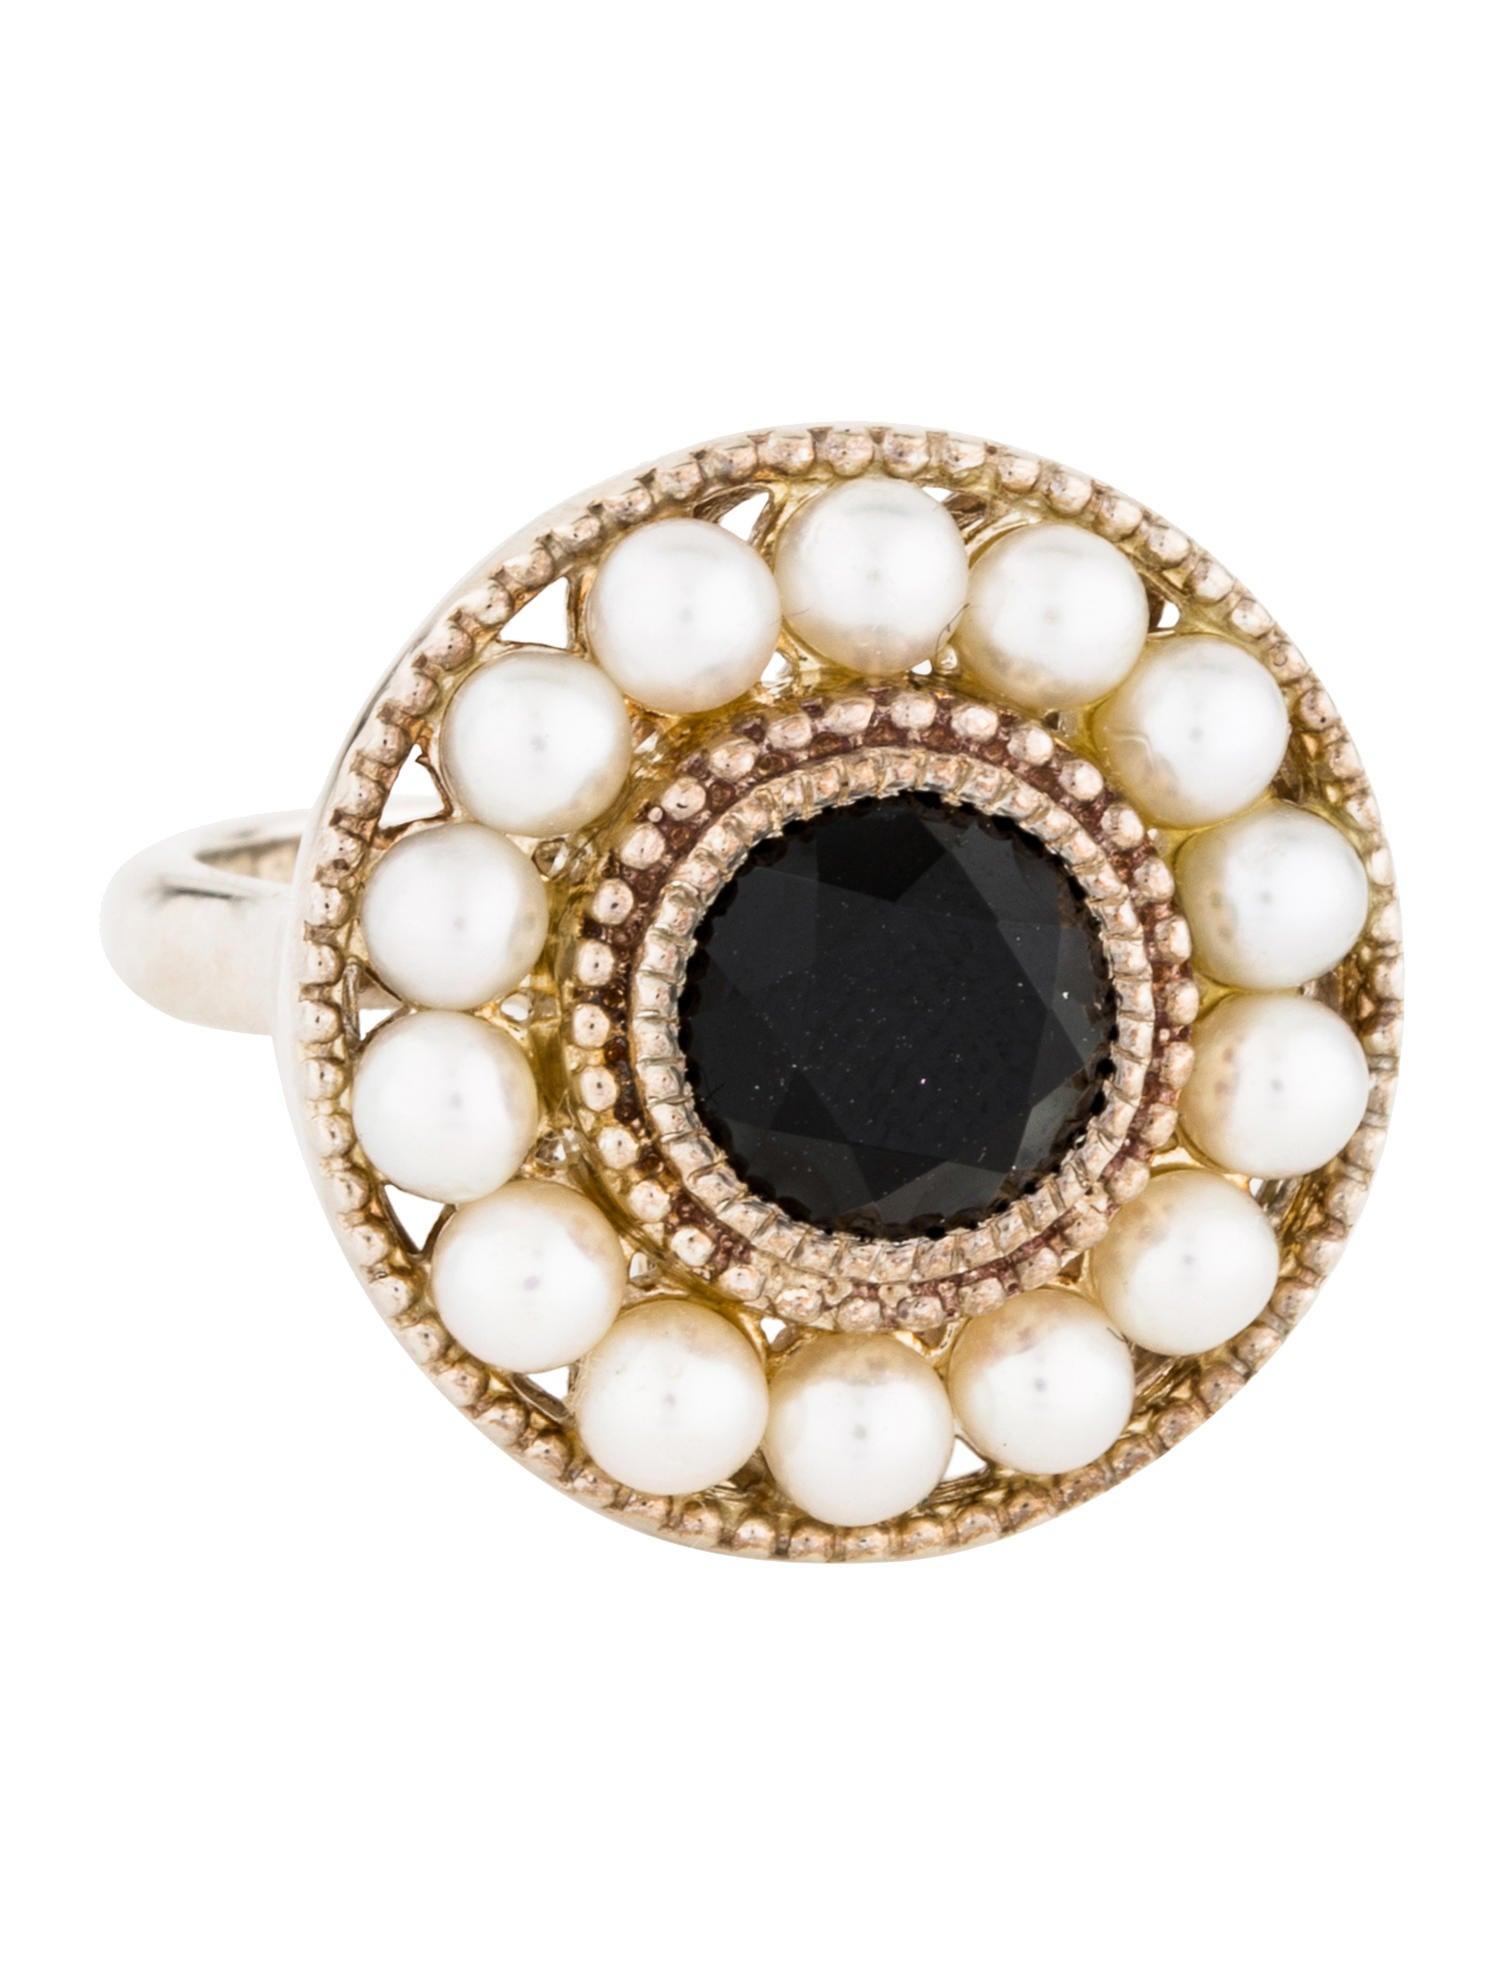 51bf47d12 Tiffany & Co. Ziegfeld Onyx & Pearl Cocktail Ring - Rings - TIF61461 ...